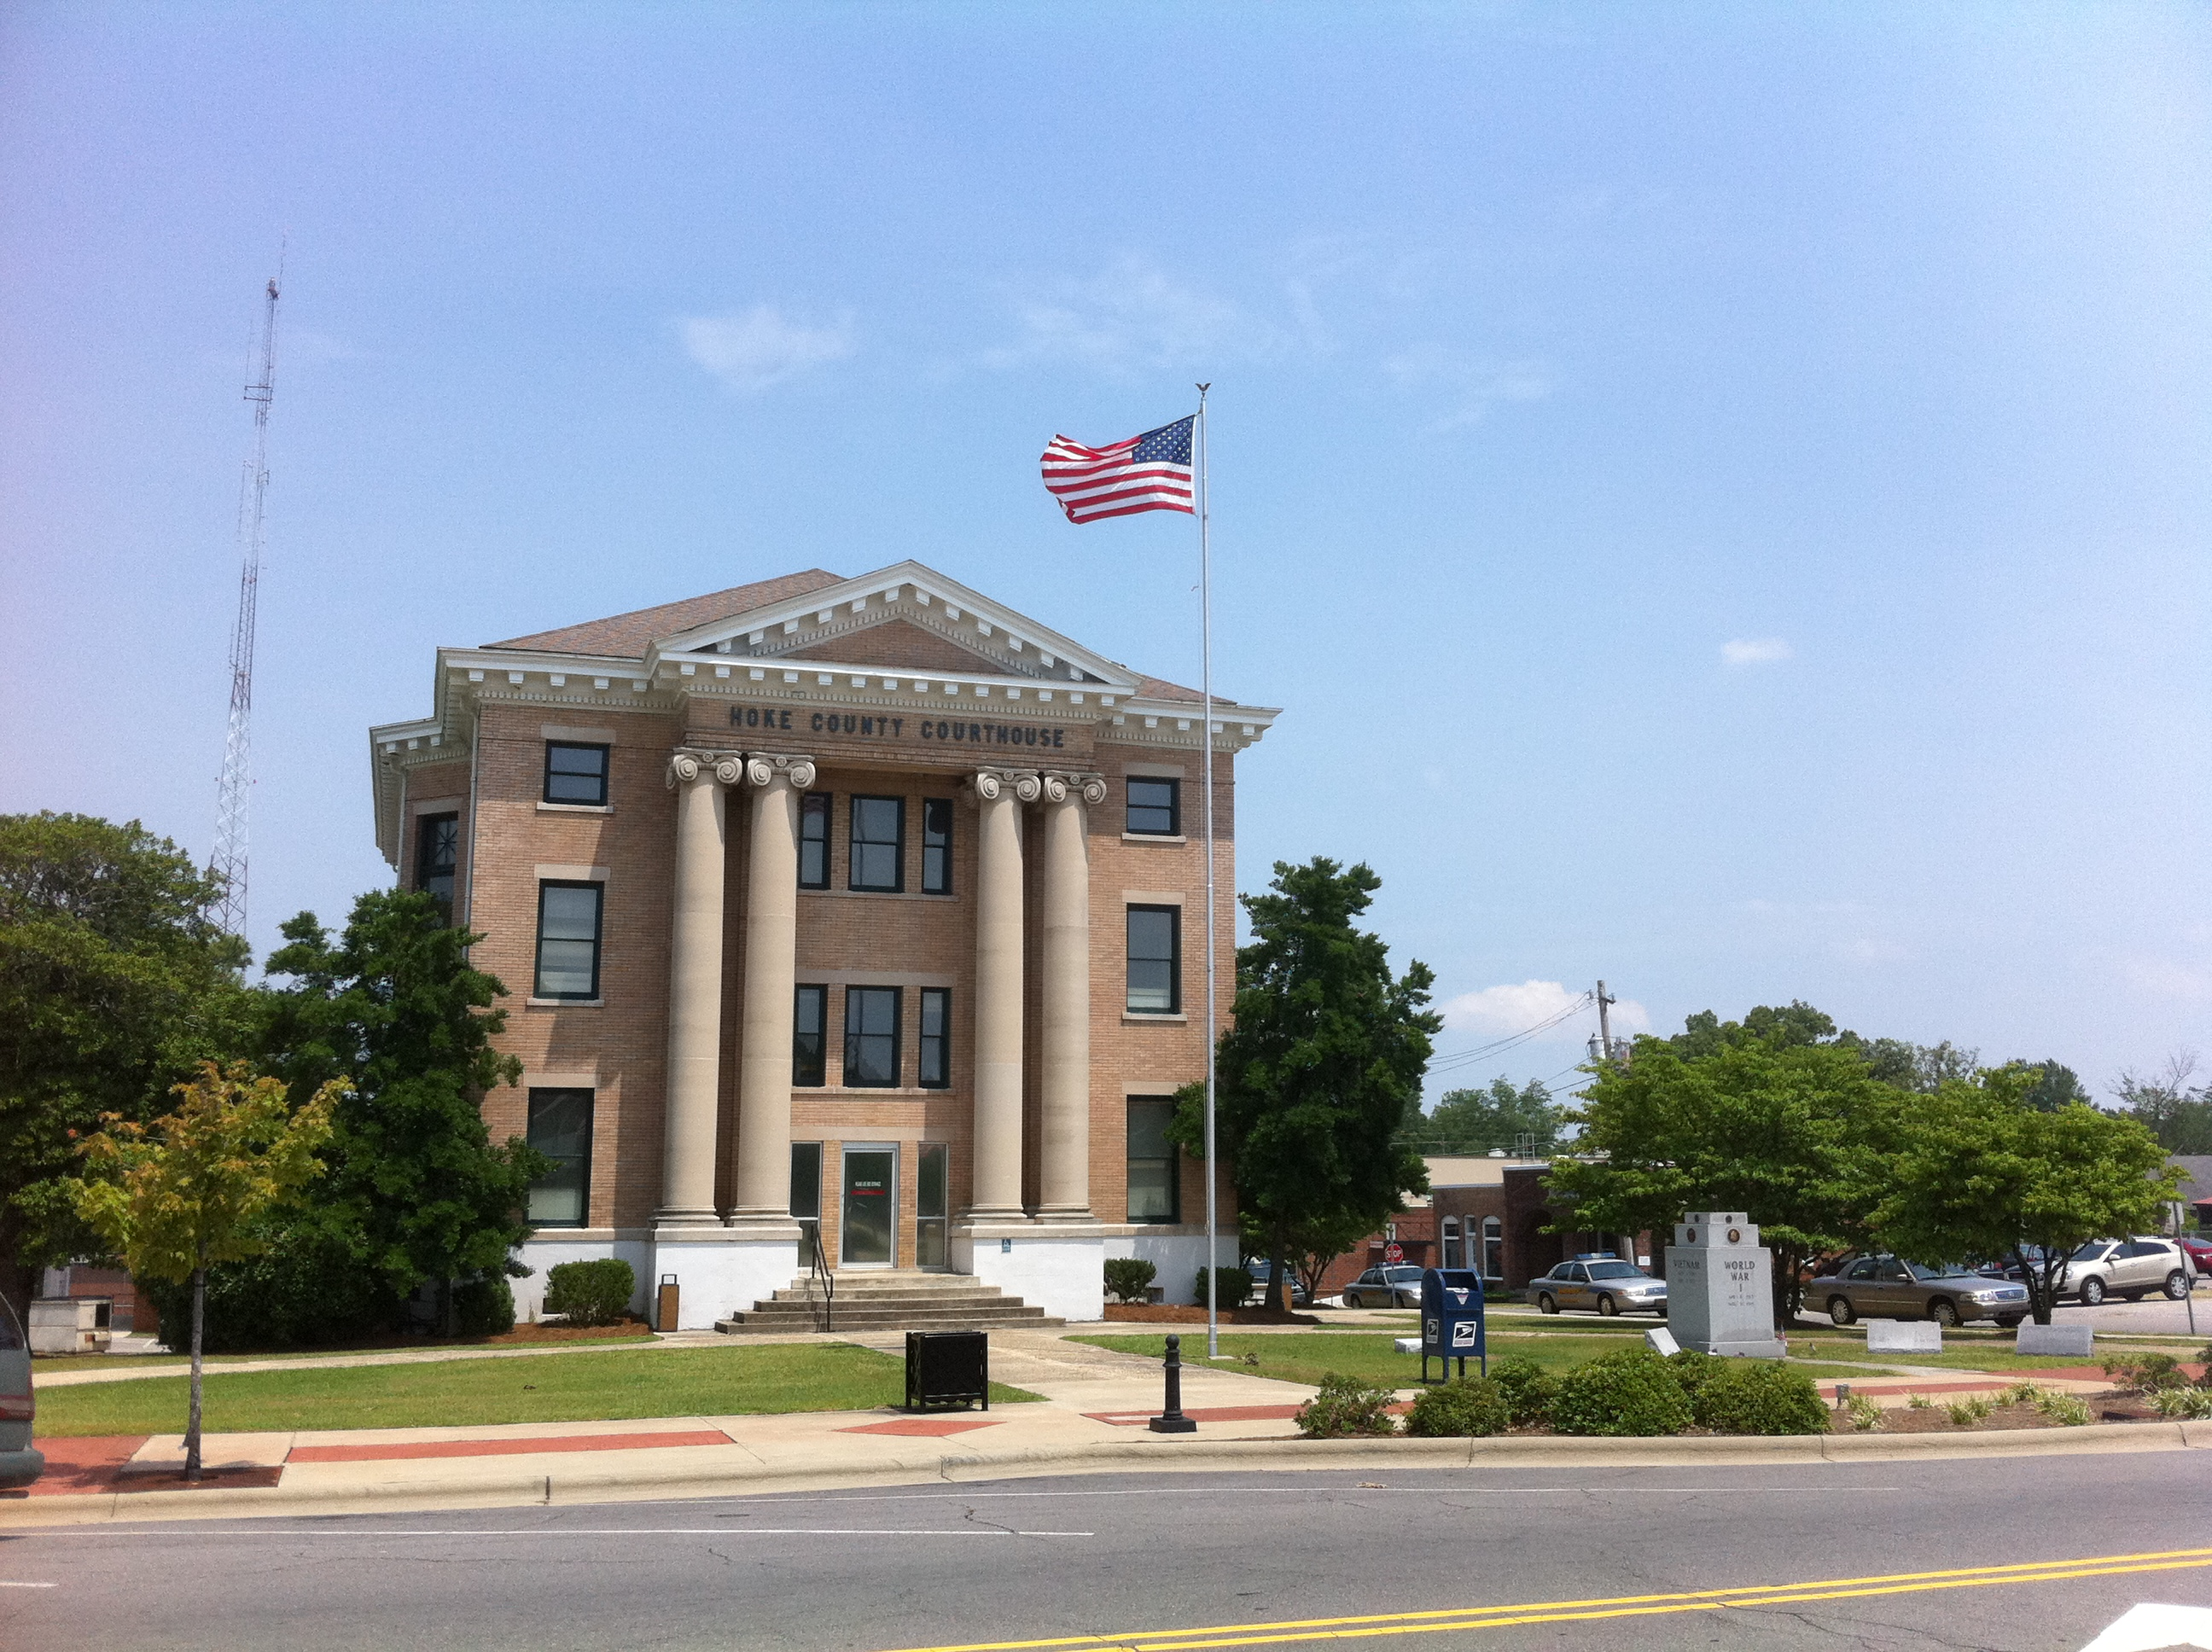 File:Hoke County Courthouse 2011-06.jpg - Wikimedia Commonsbalance of hoke county